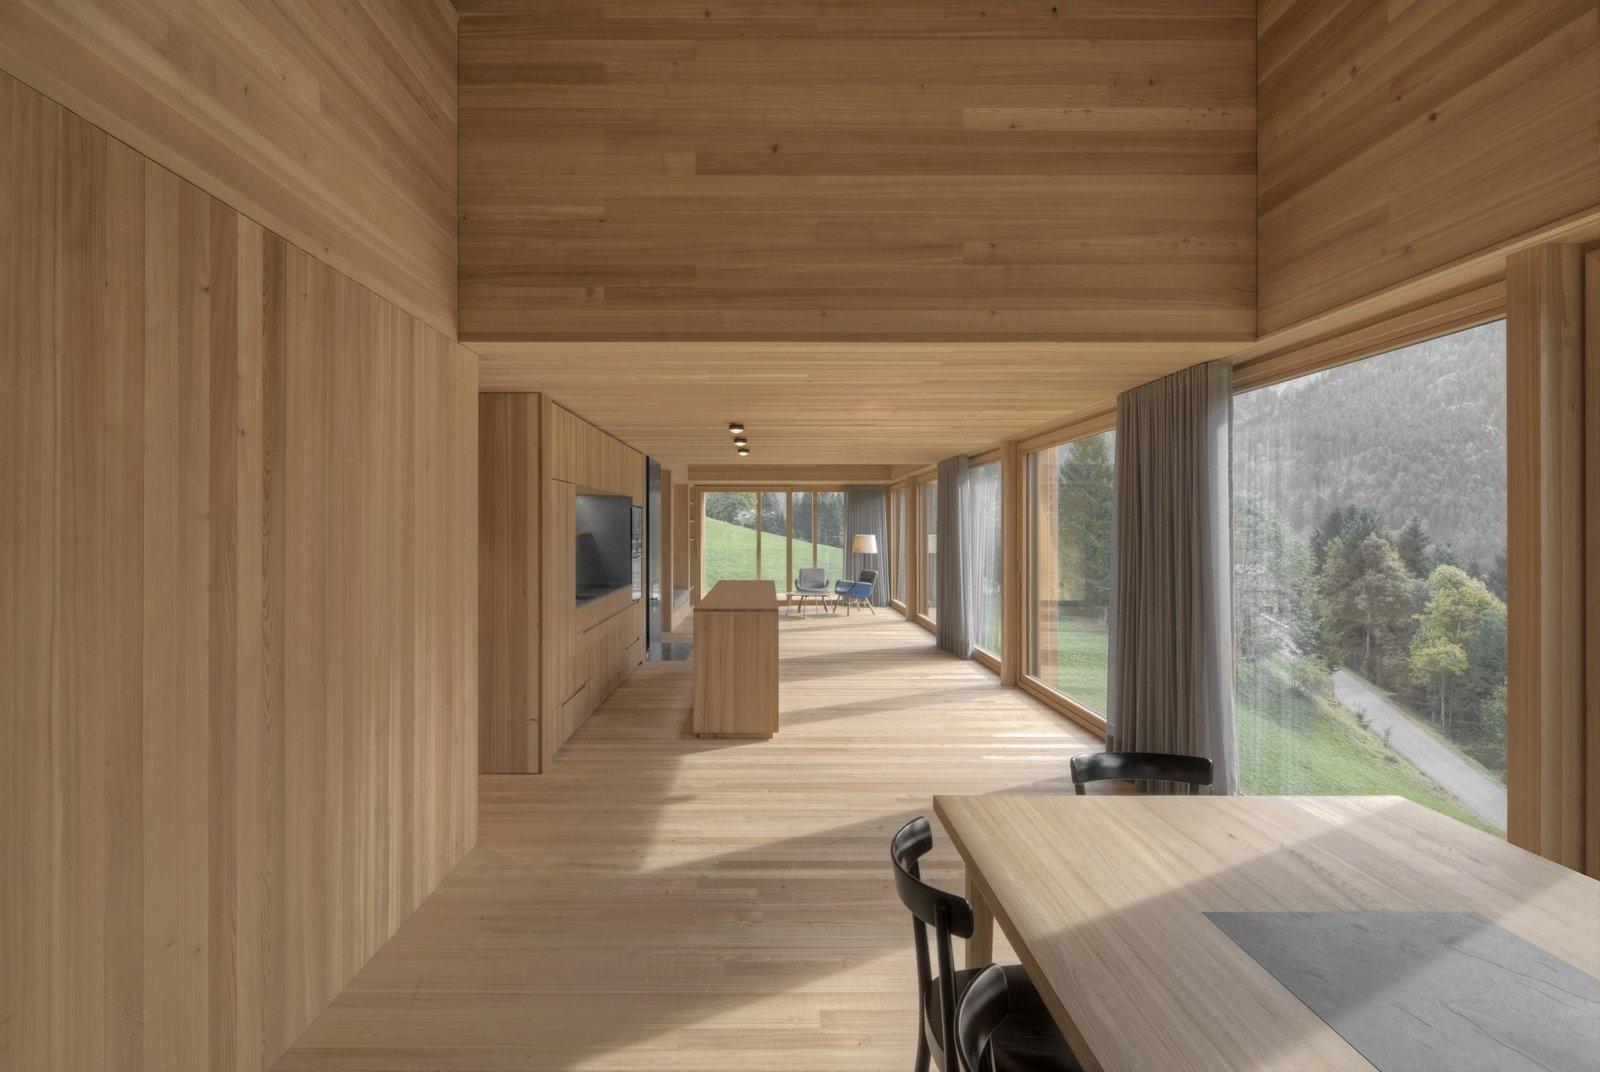 Stürcher forest House Bernardo Bader  Modern Rustic